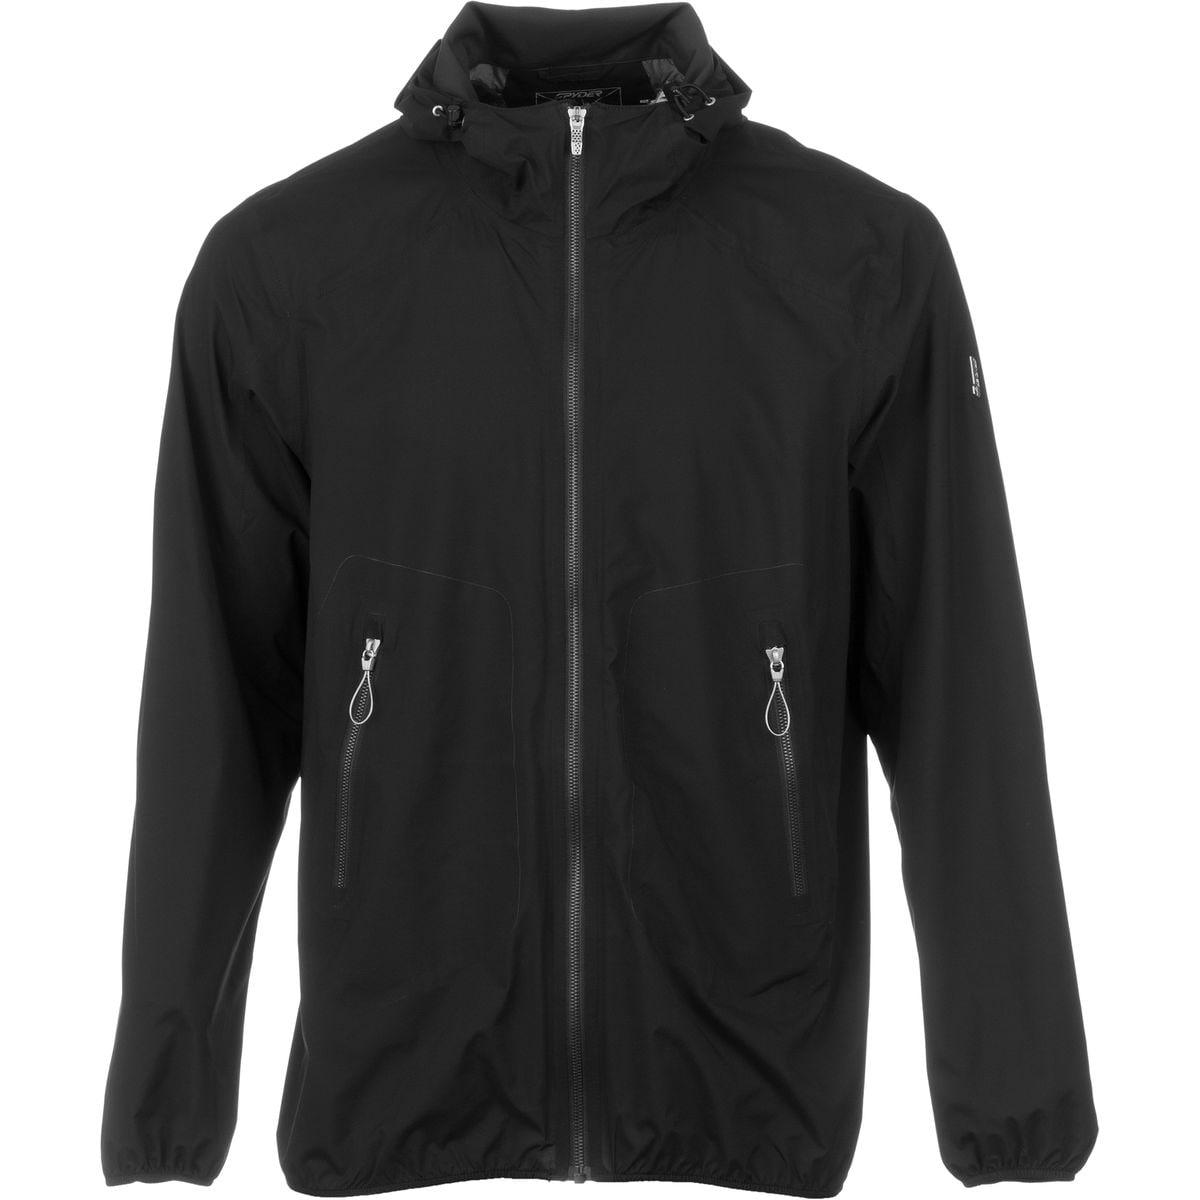 Spyder Diffuser Jacket